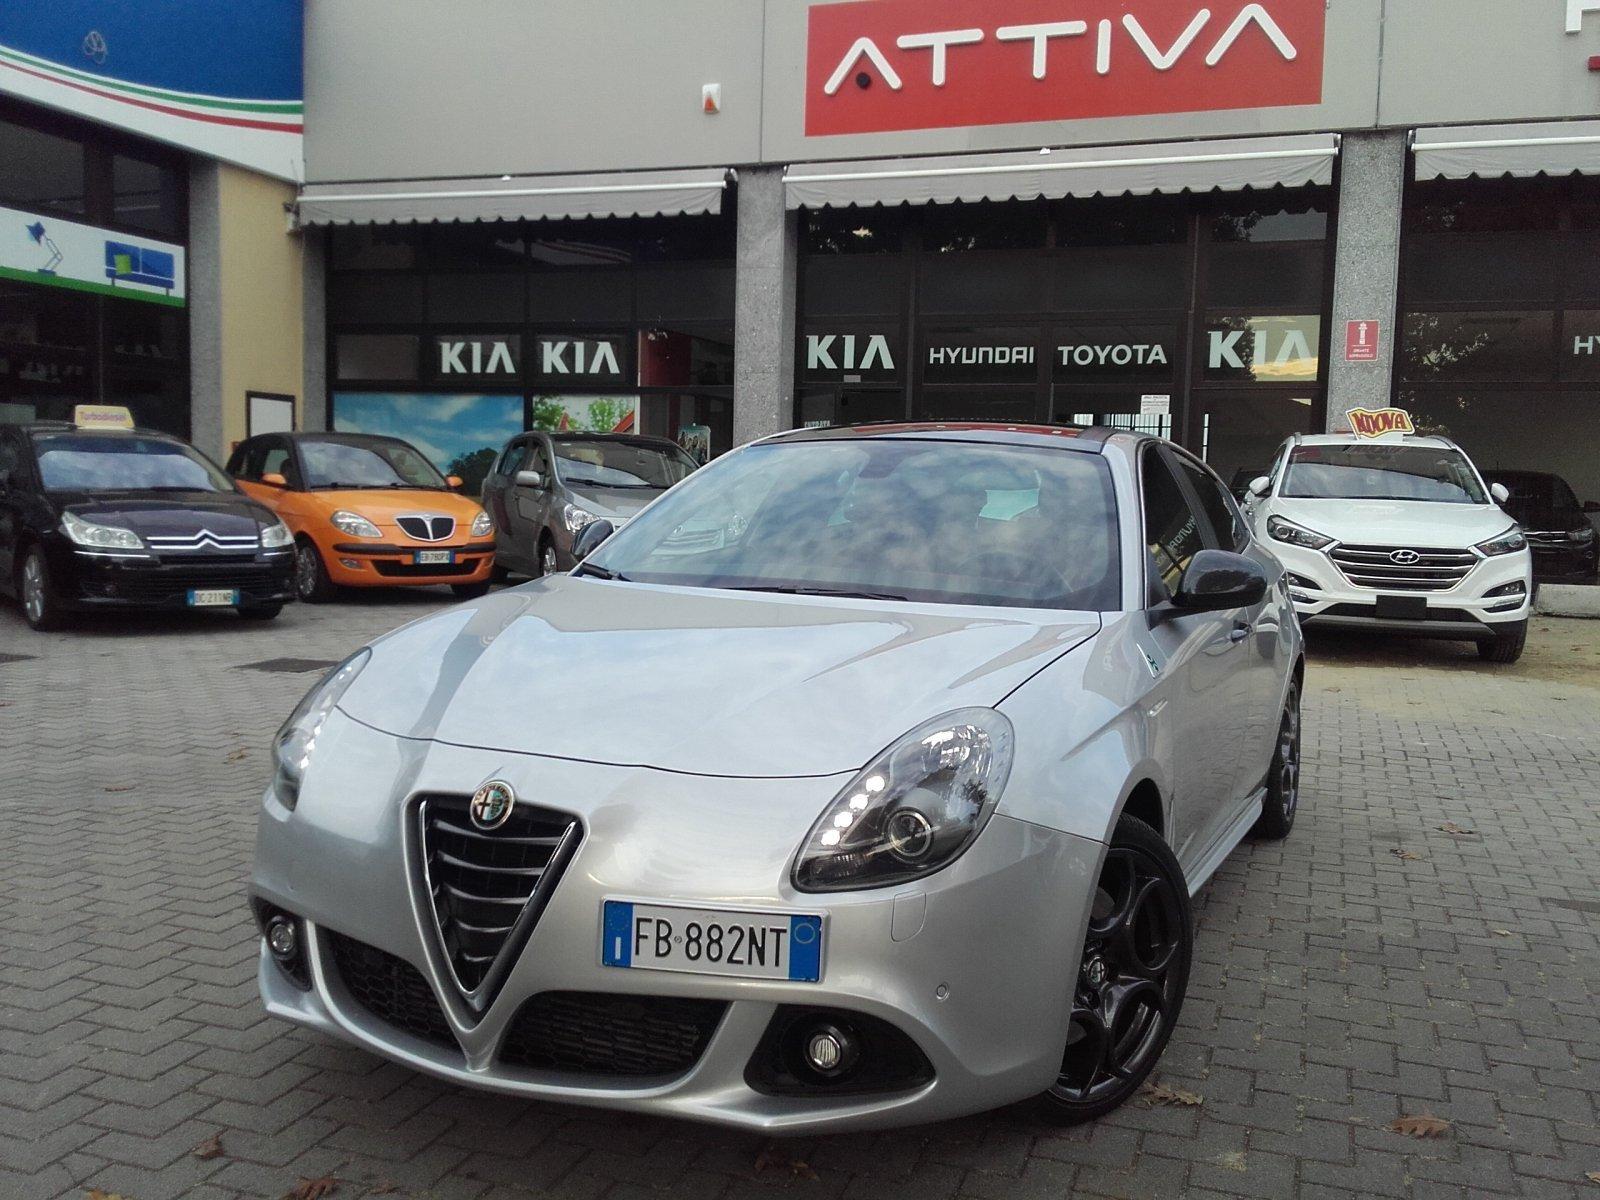 Lancia Ypsilon 1.3 MJT 5P. Silver grigia